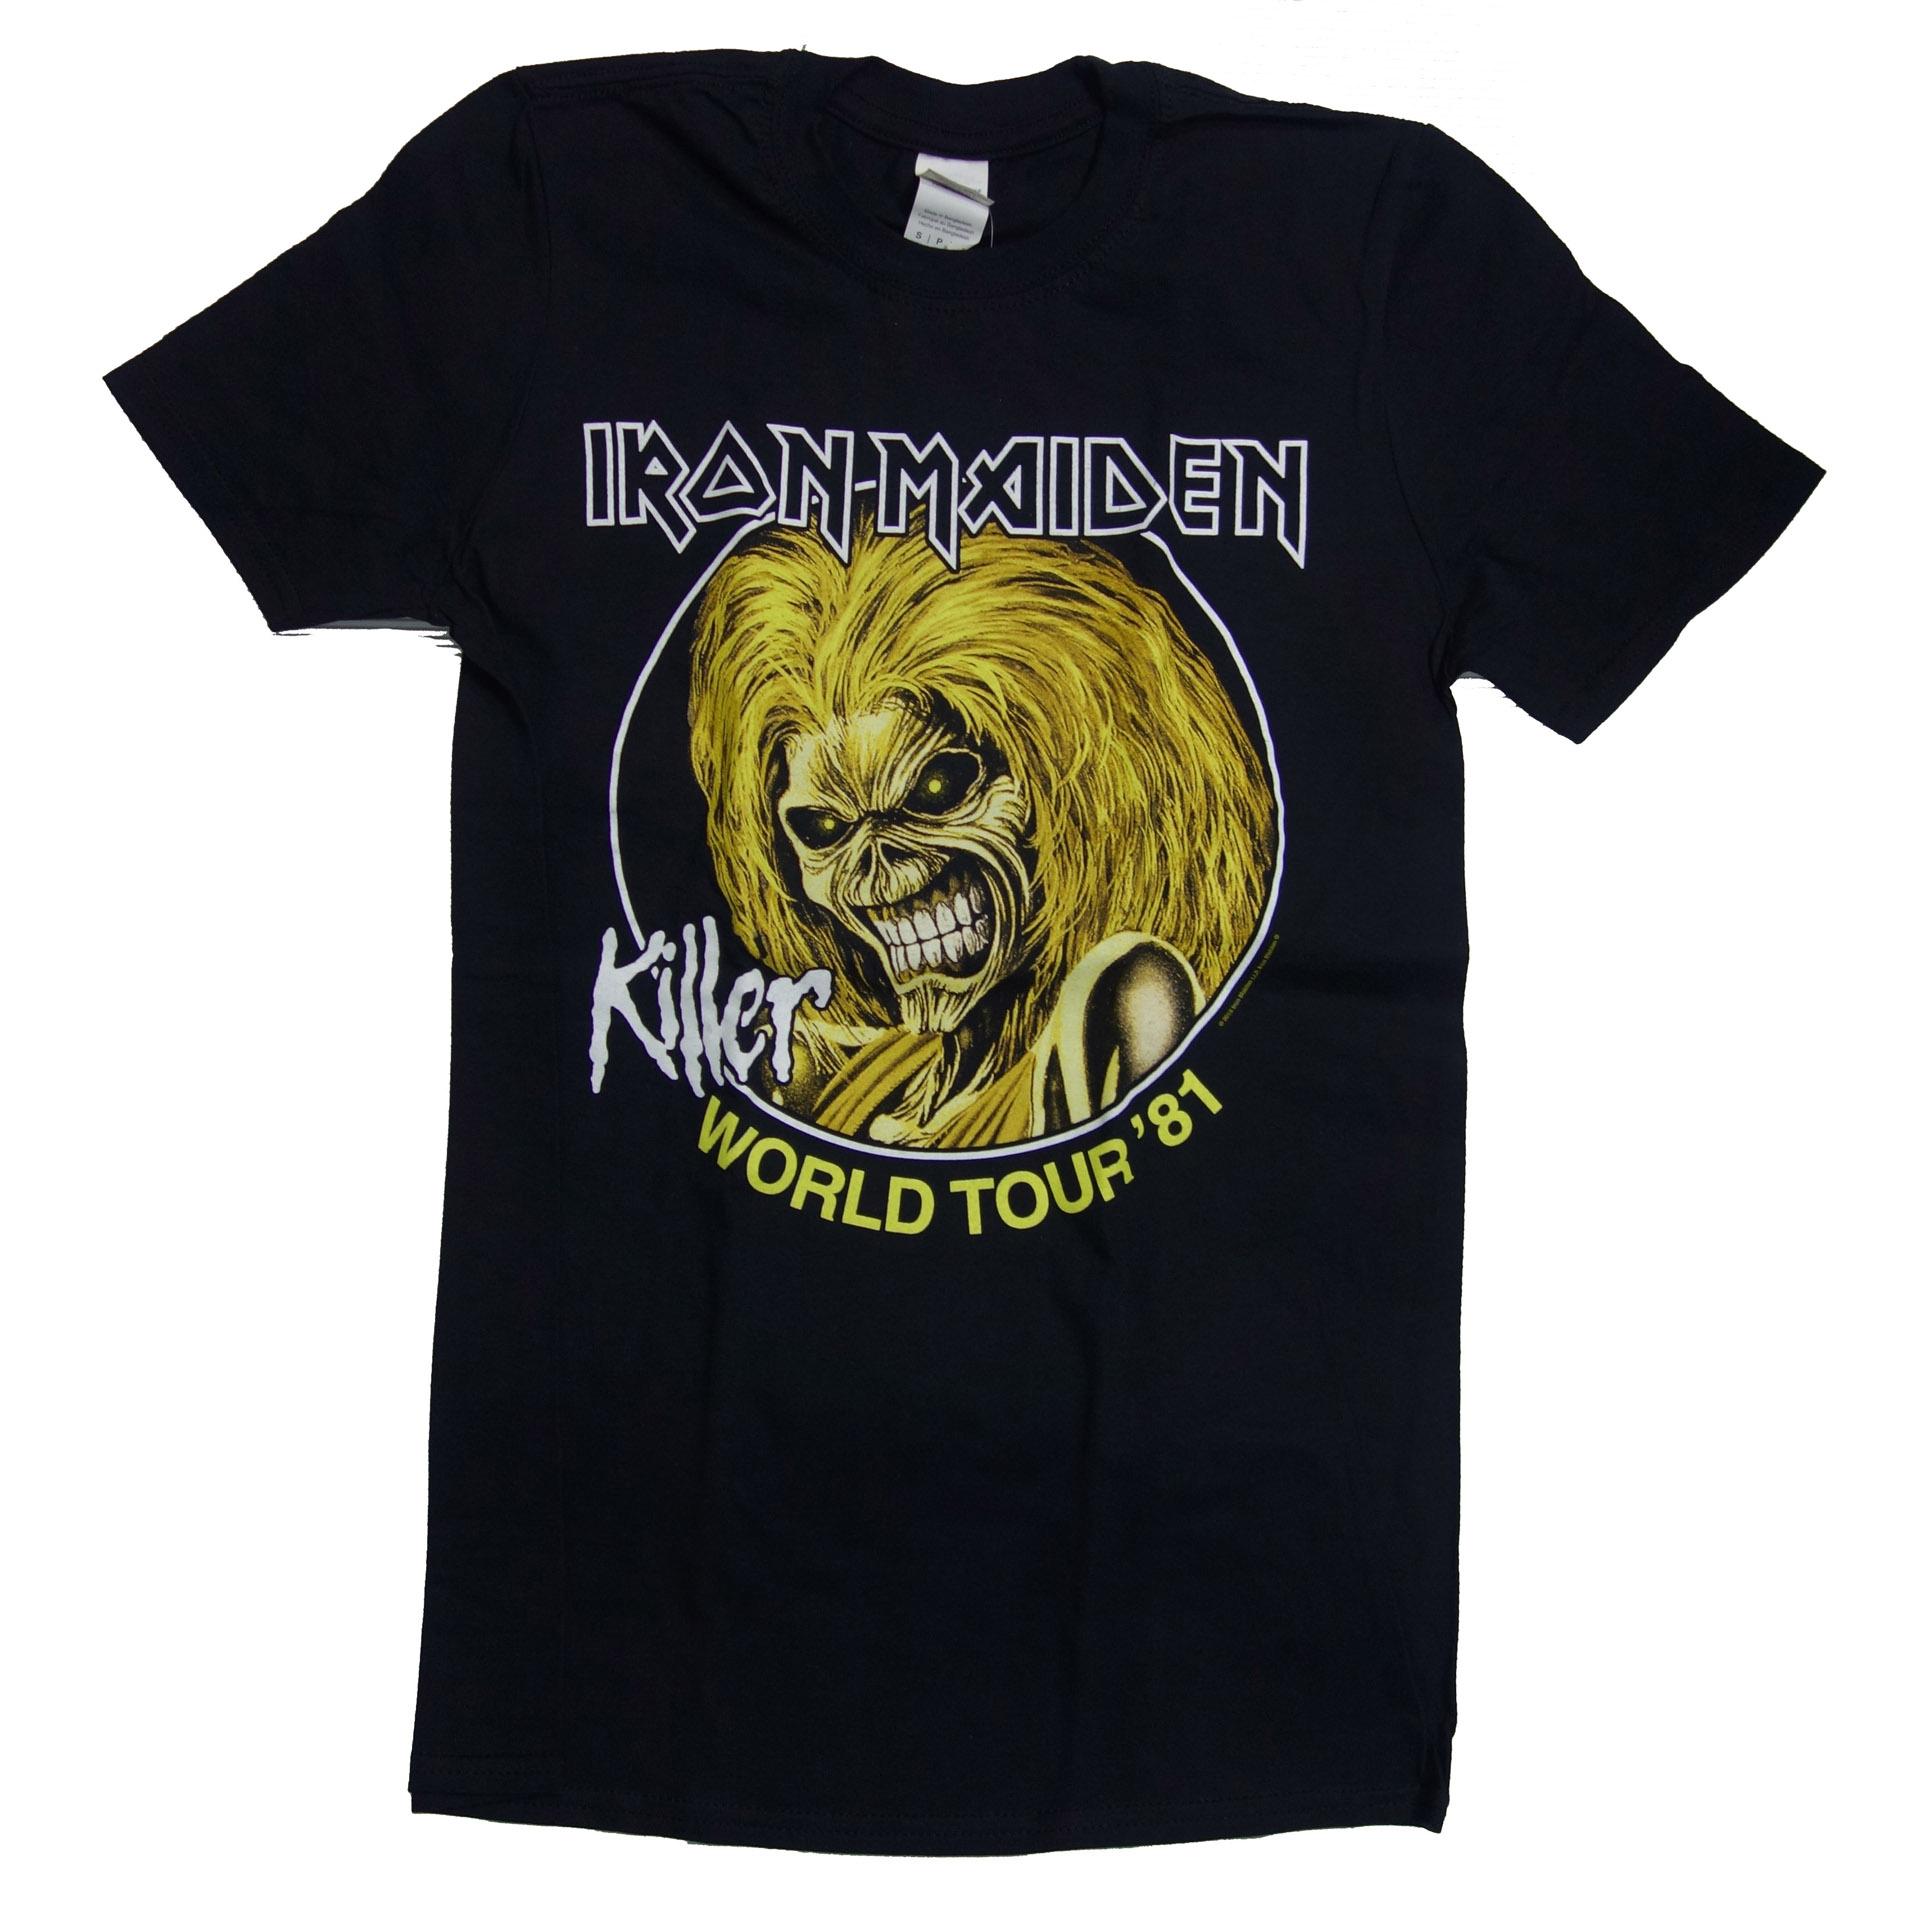 T-Shirt Iron Maiden Killers World Tour 1981